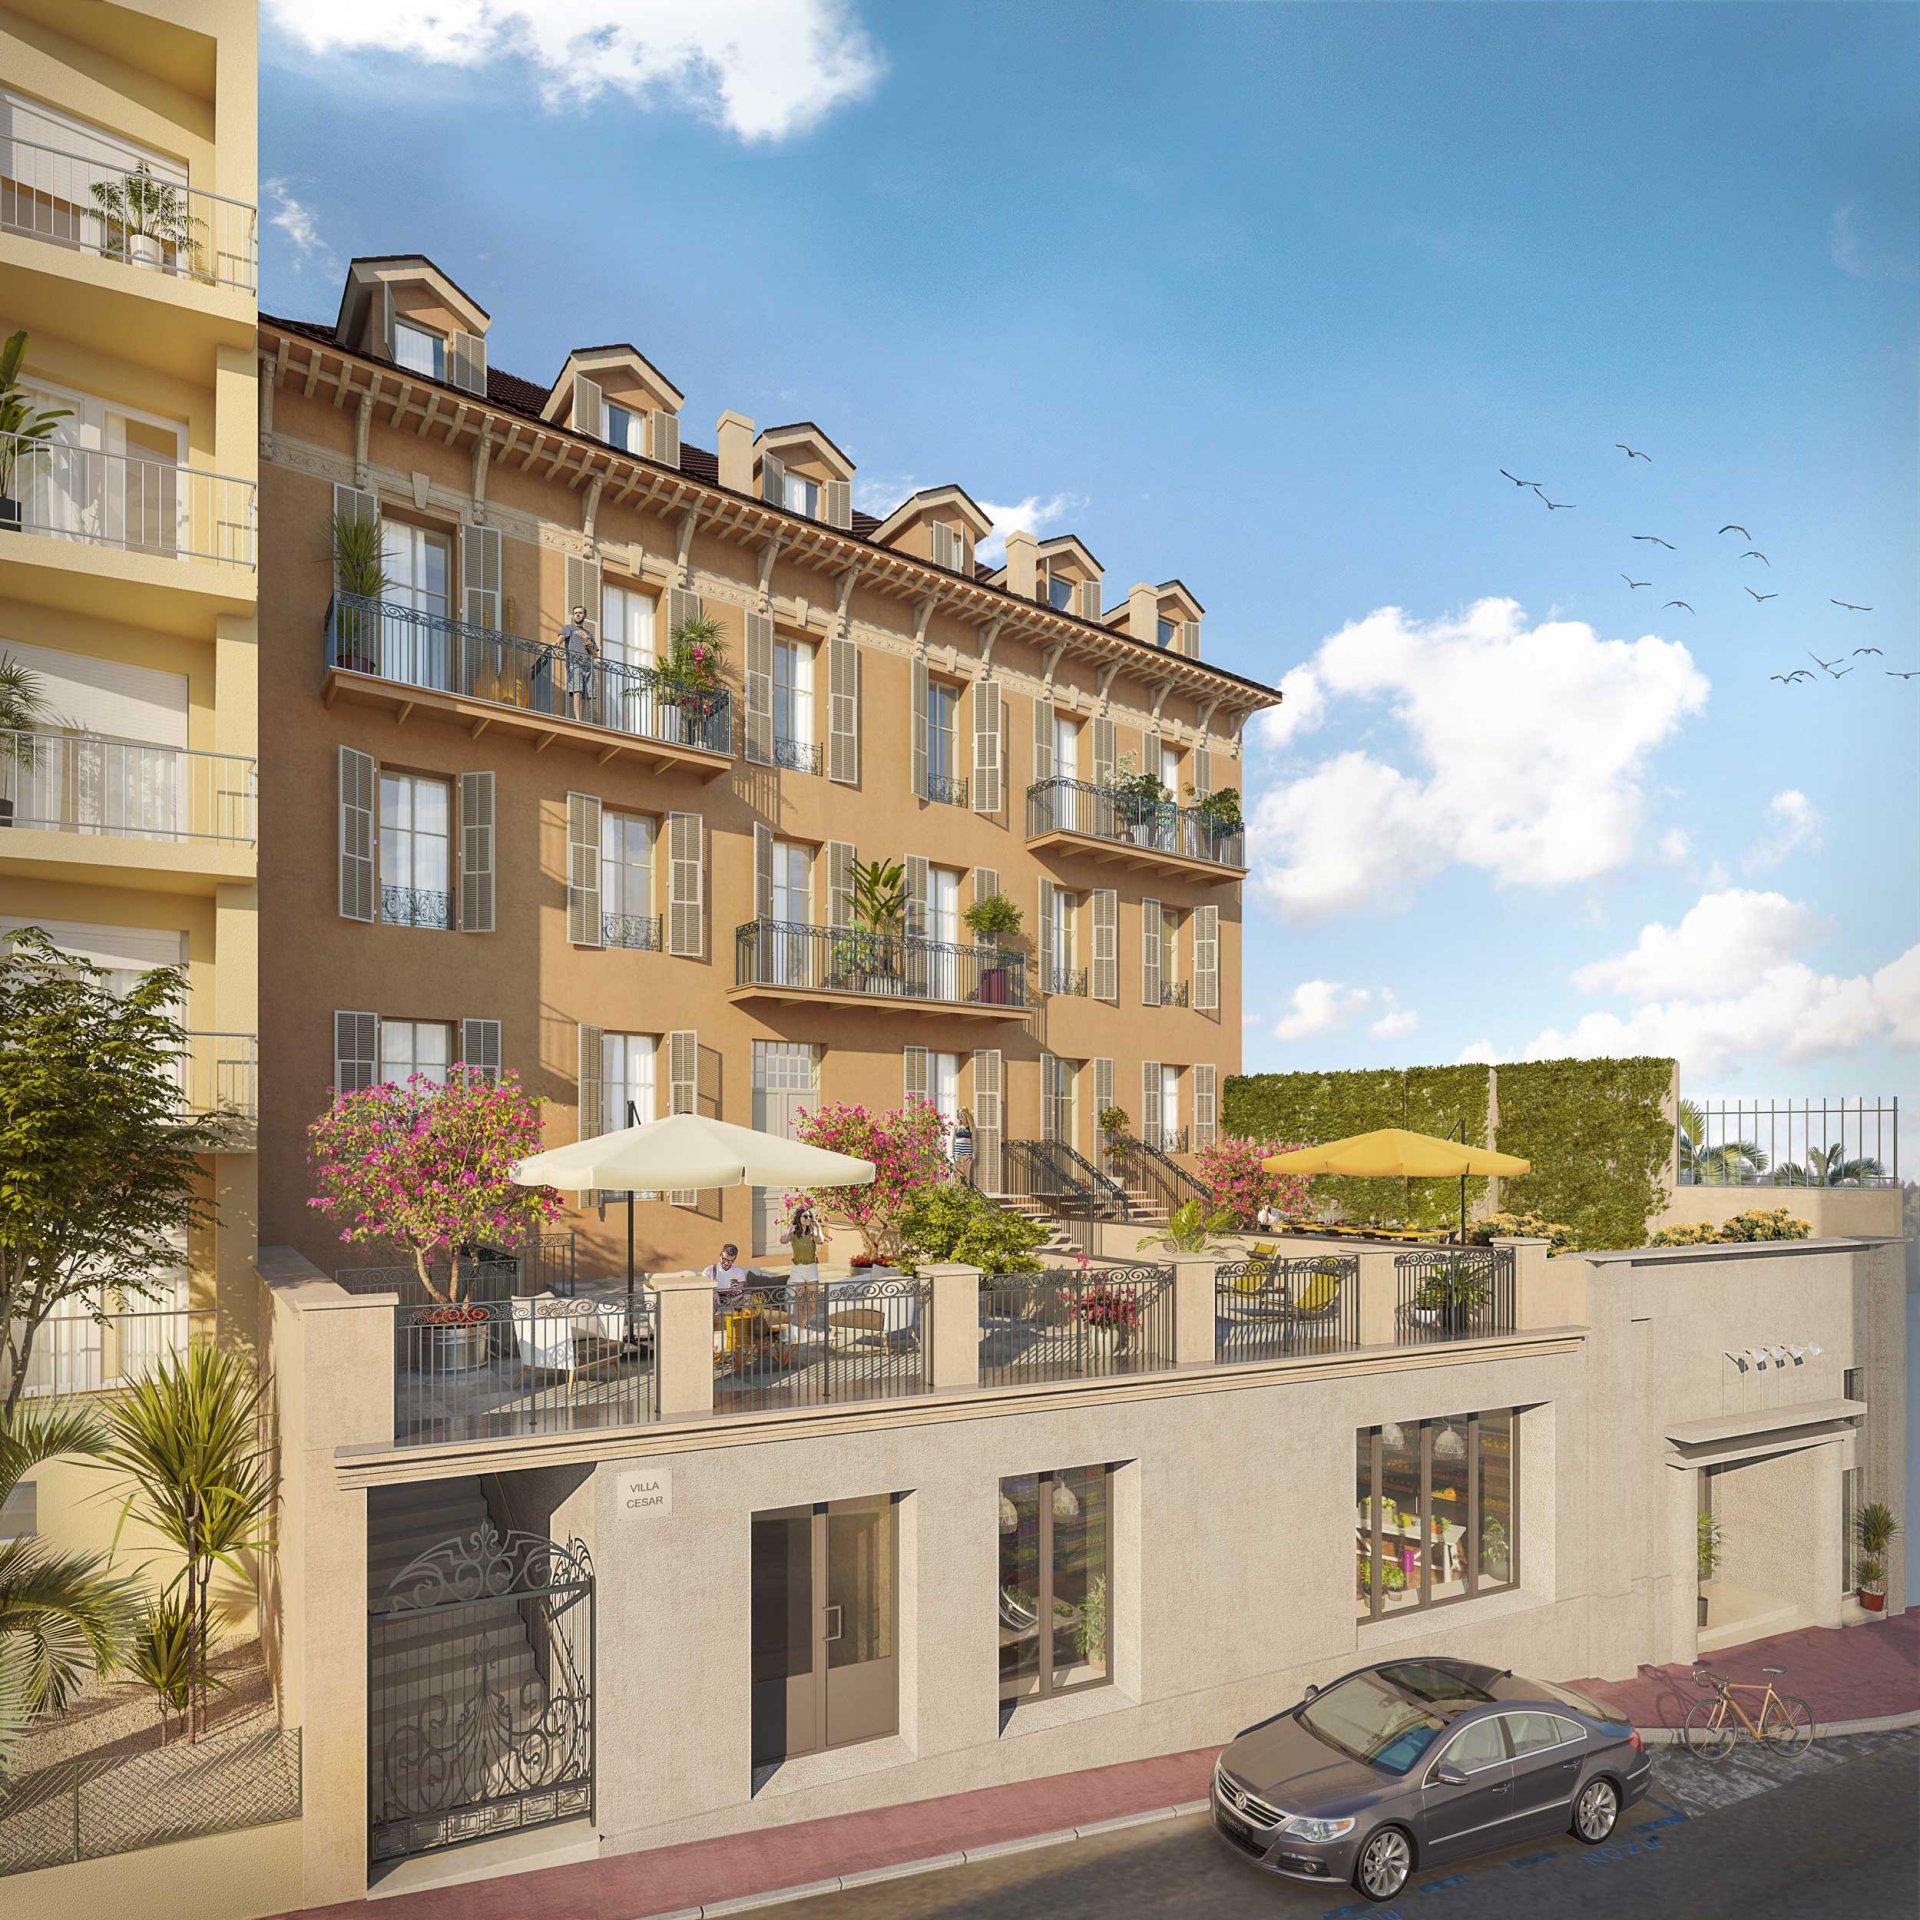 Vente Duplex - Villefranche-sur-Mer